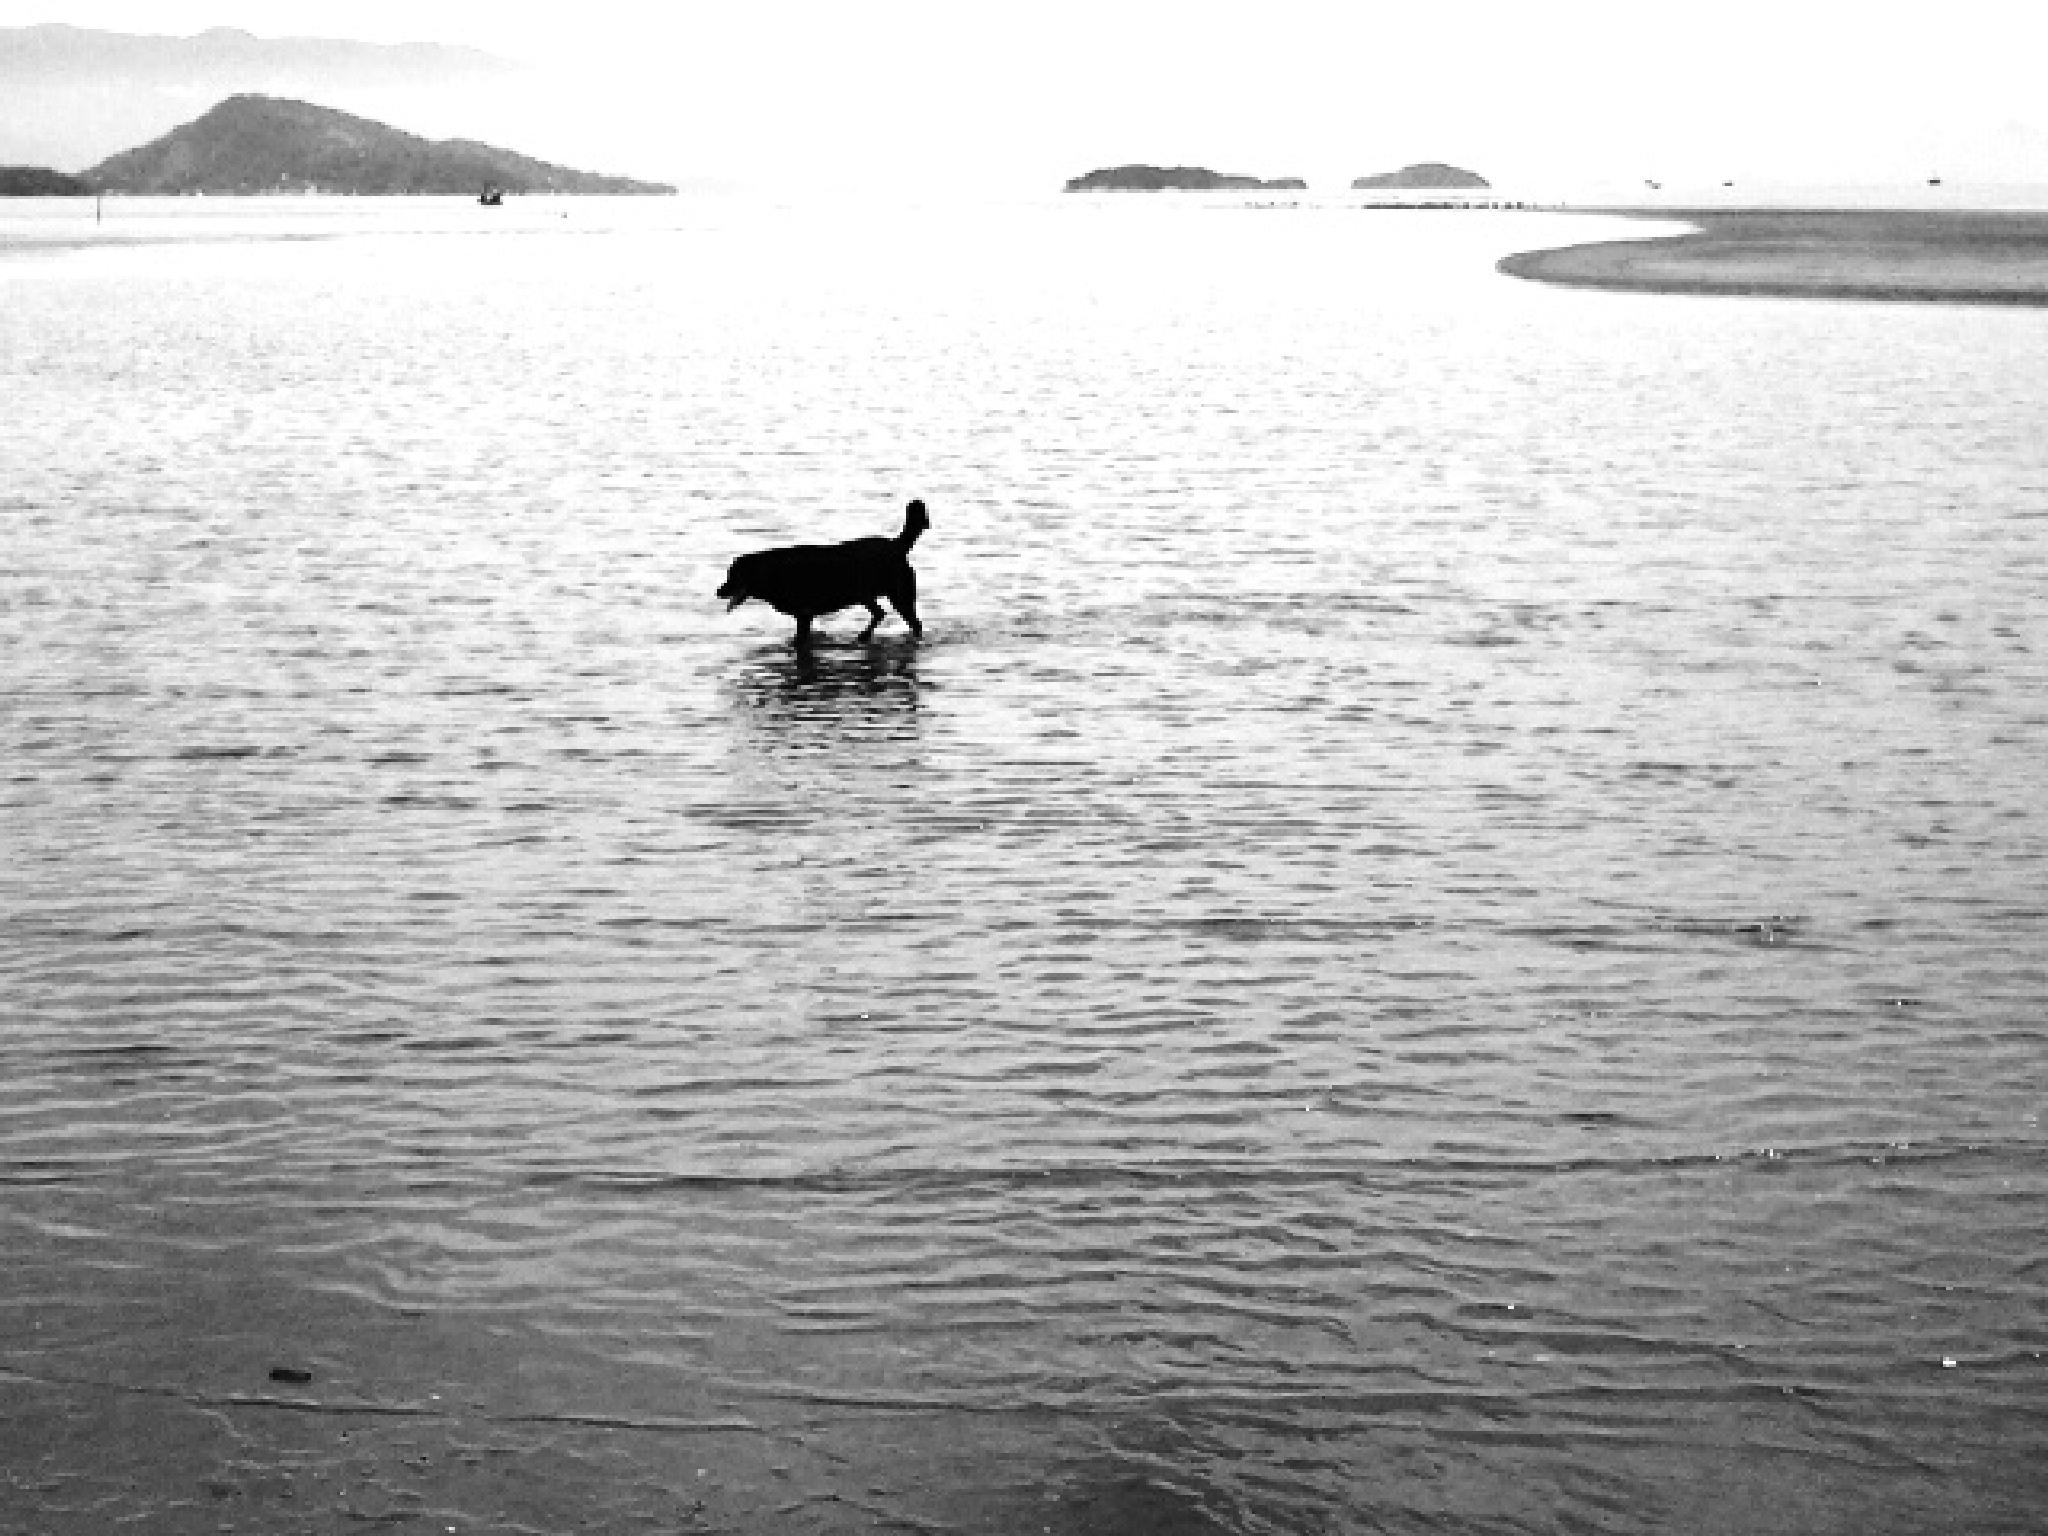 Untitled by Ana Carvalho